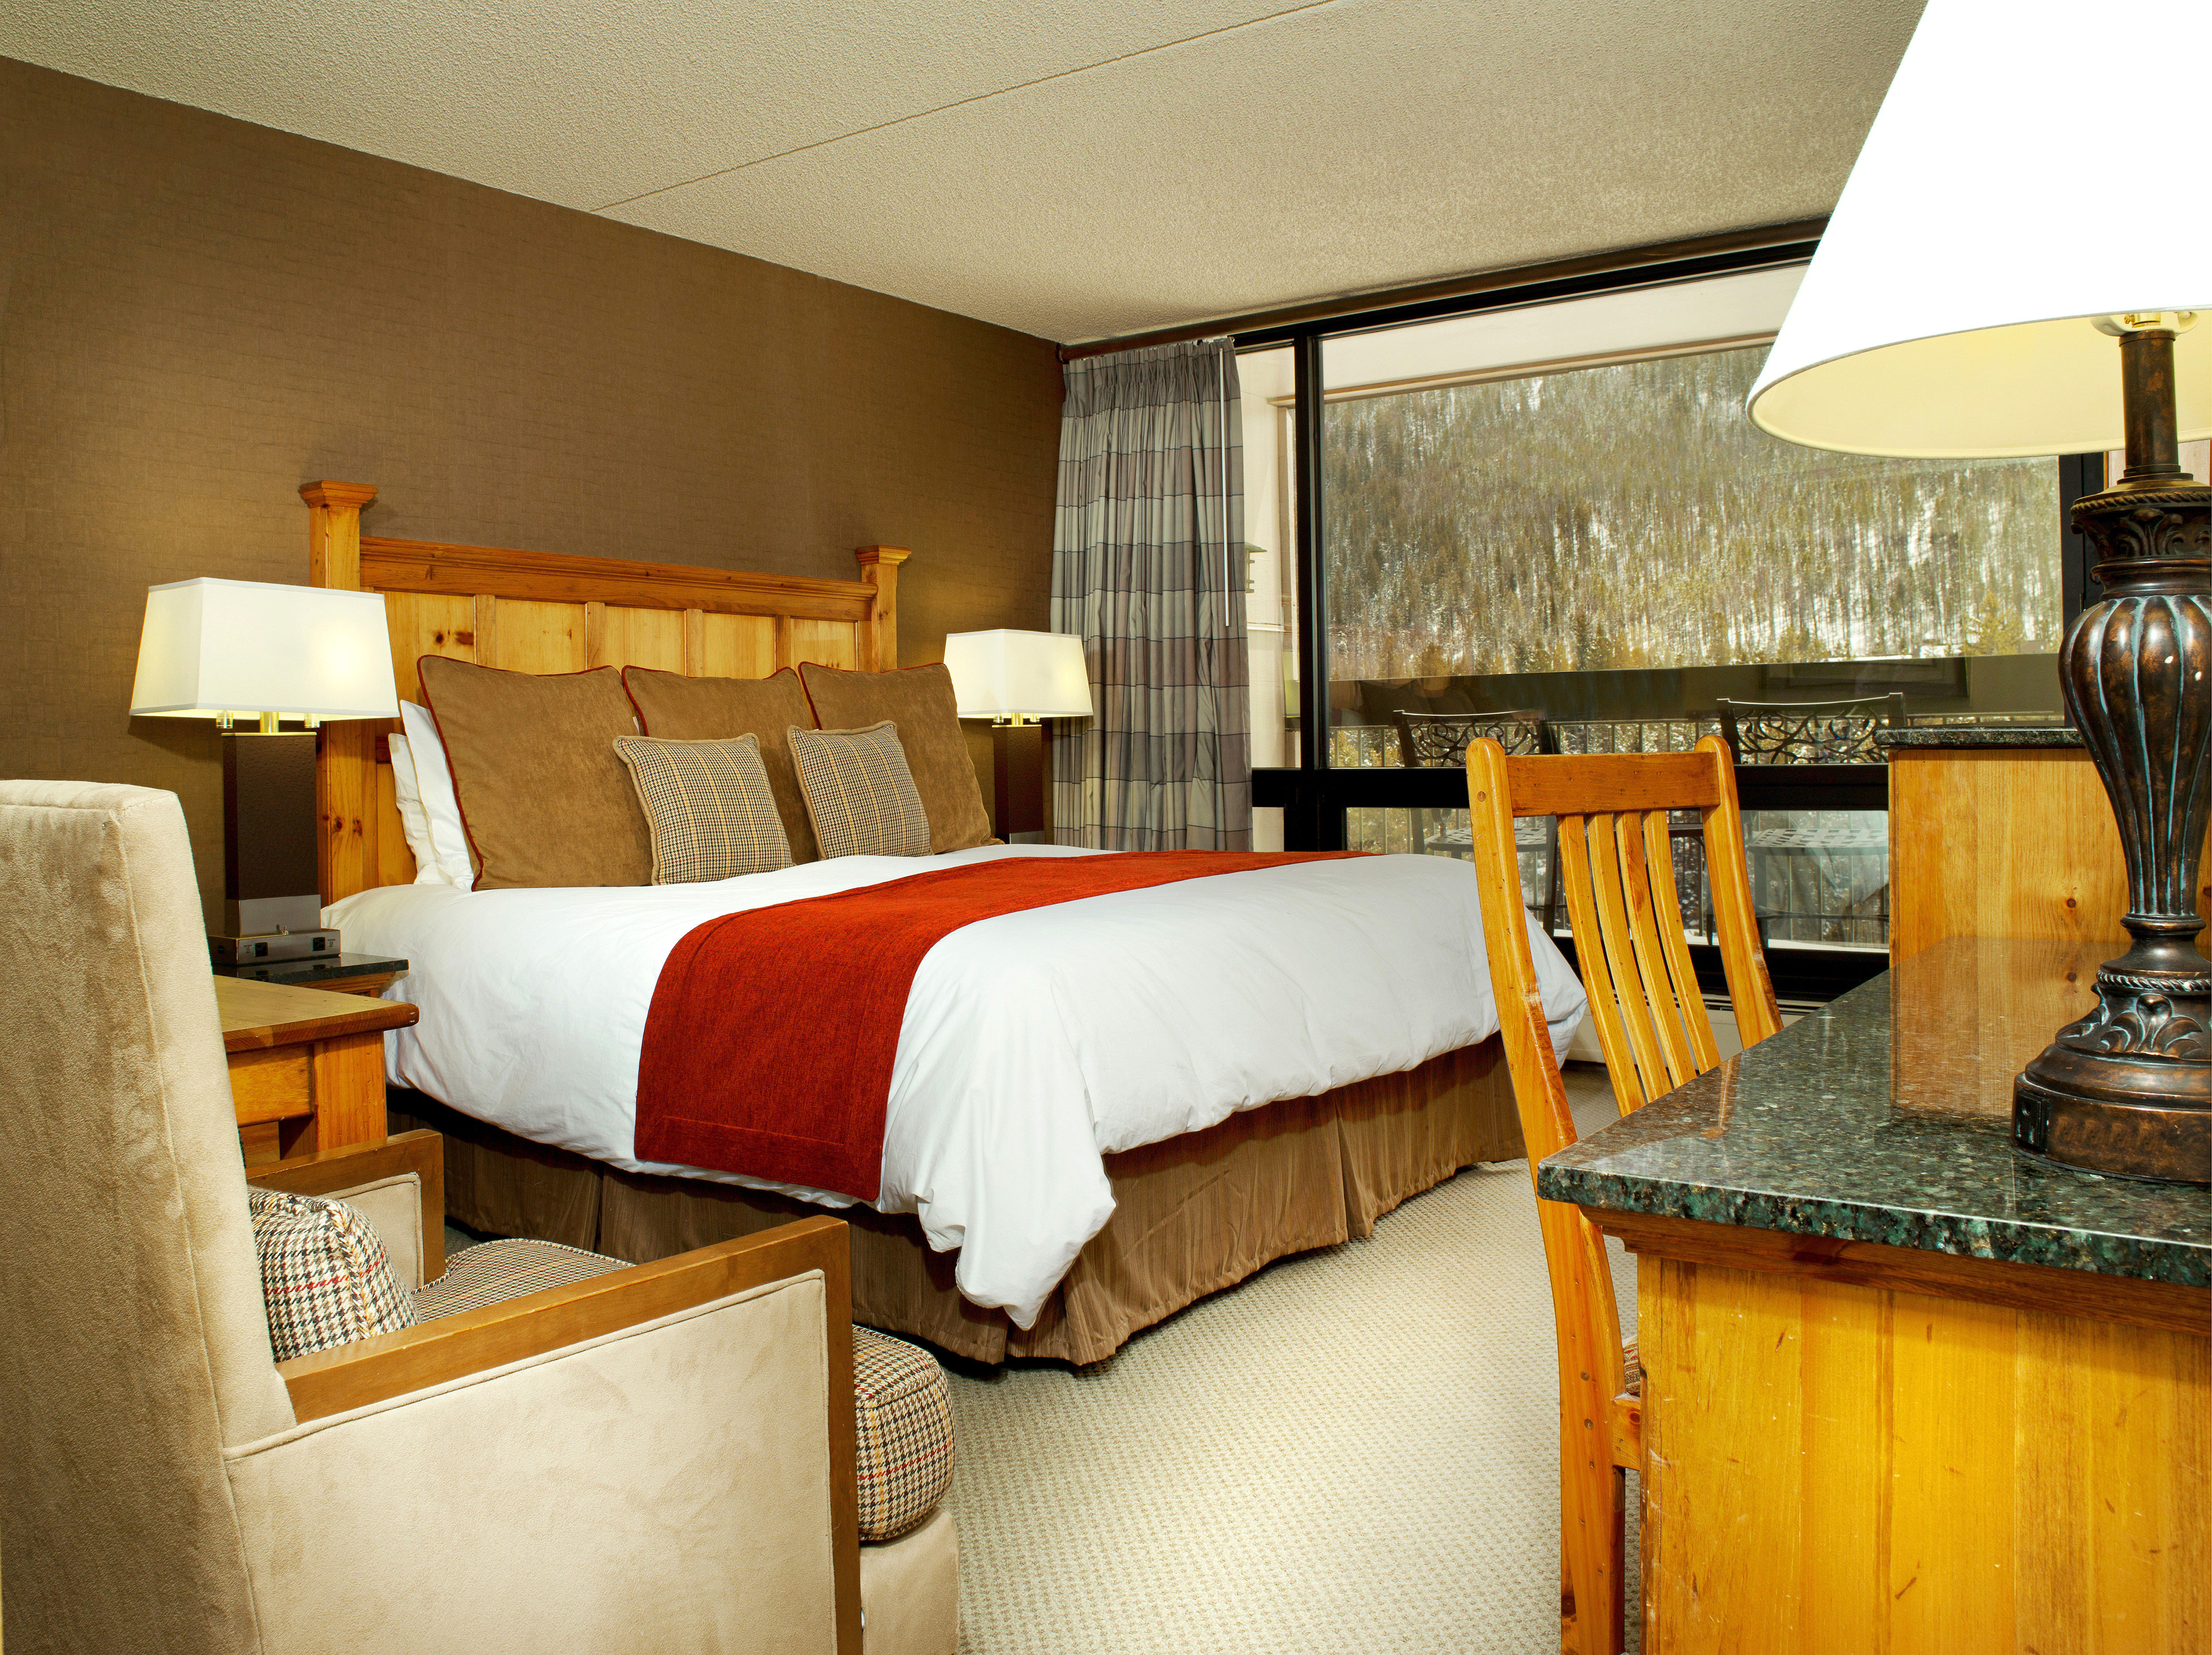 Bedroom Lodge Rustic property Suite cottage lamp